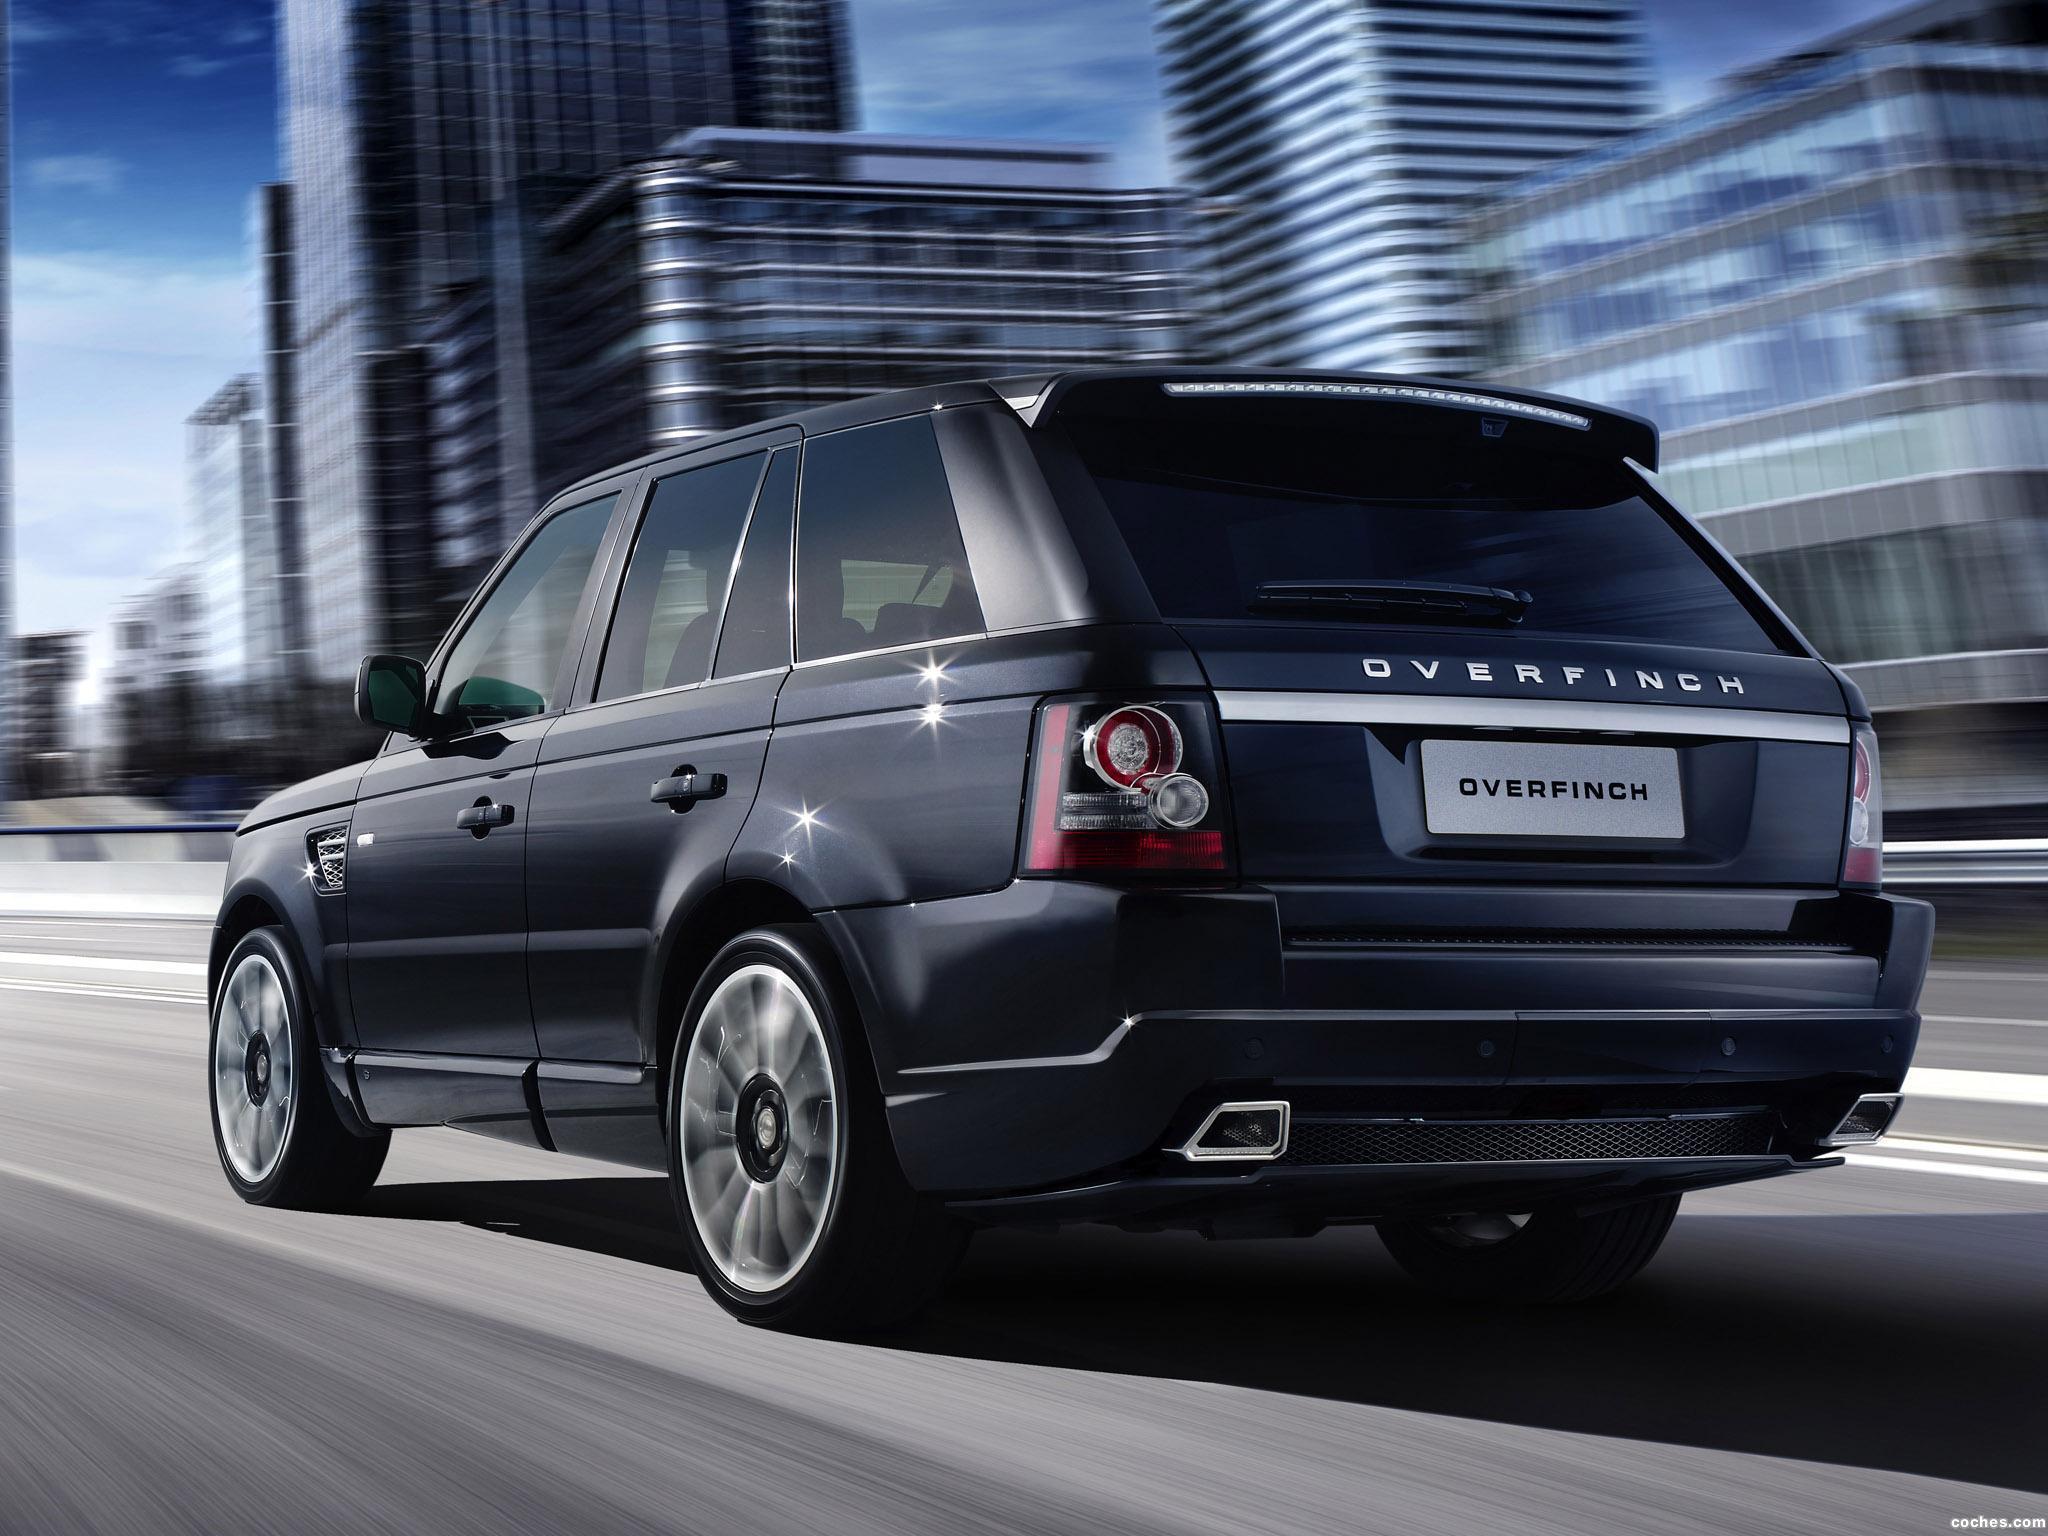 Foto 2 de Overfinch Land Rover Range Rover Sport 2009